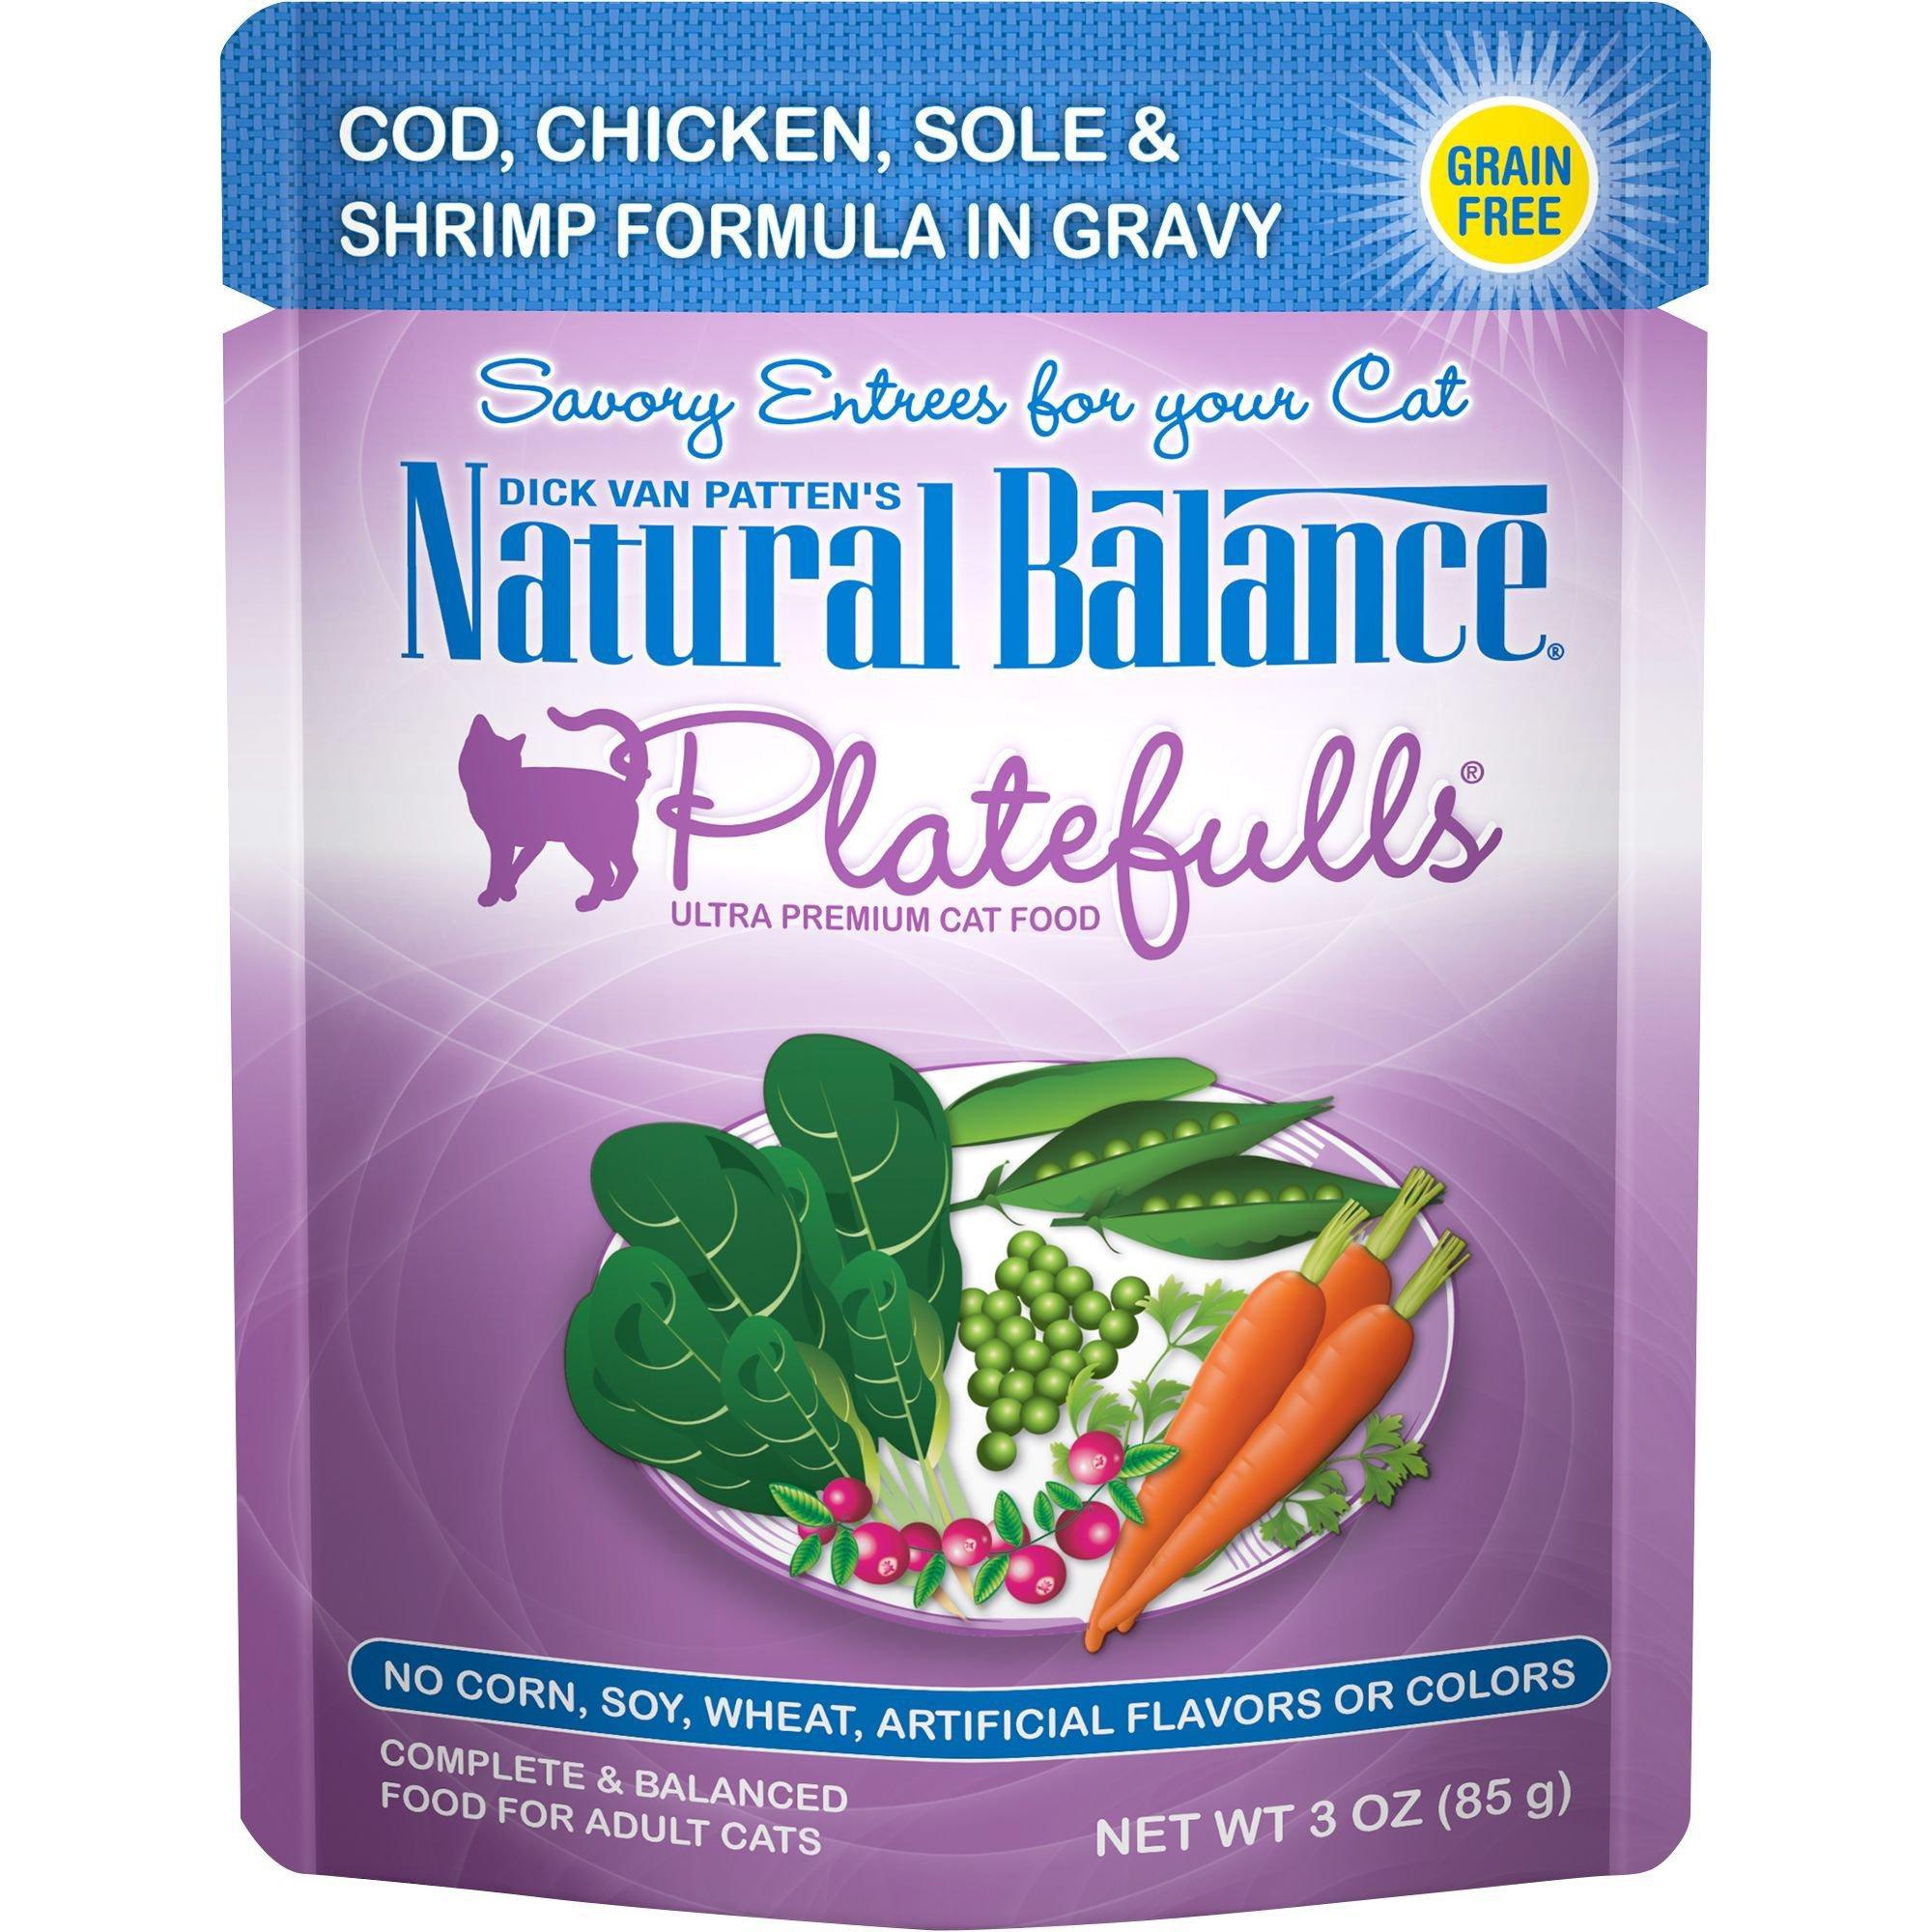 Natural Balance Platefulls Cod, Chicken, Sole & Shrimp Adult Cat Food